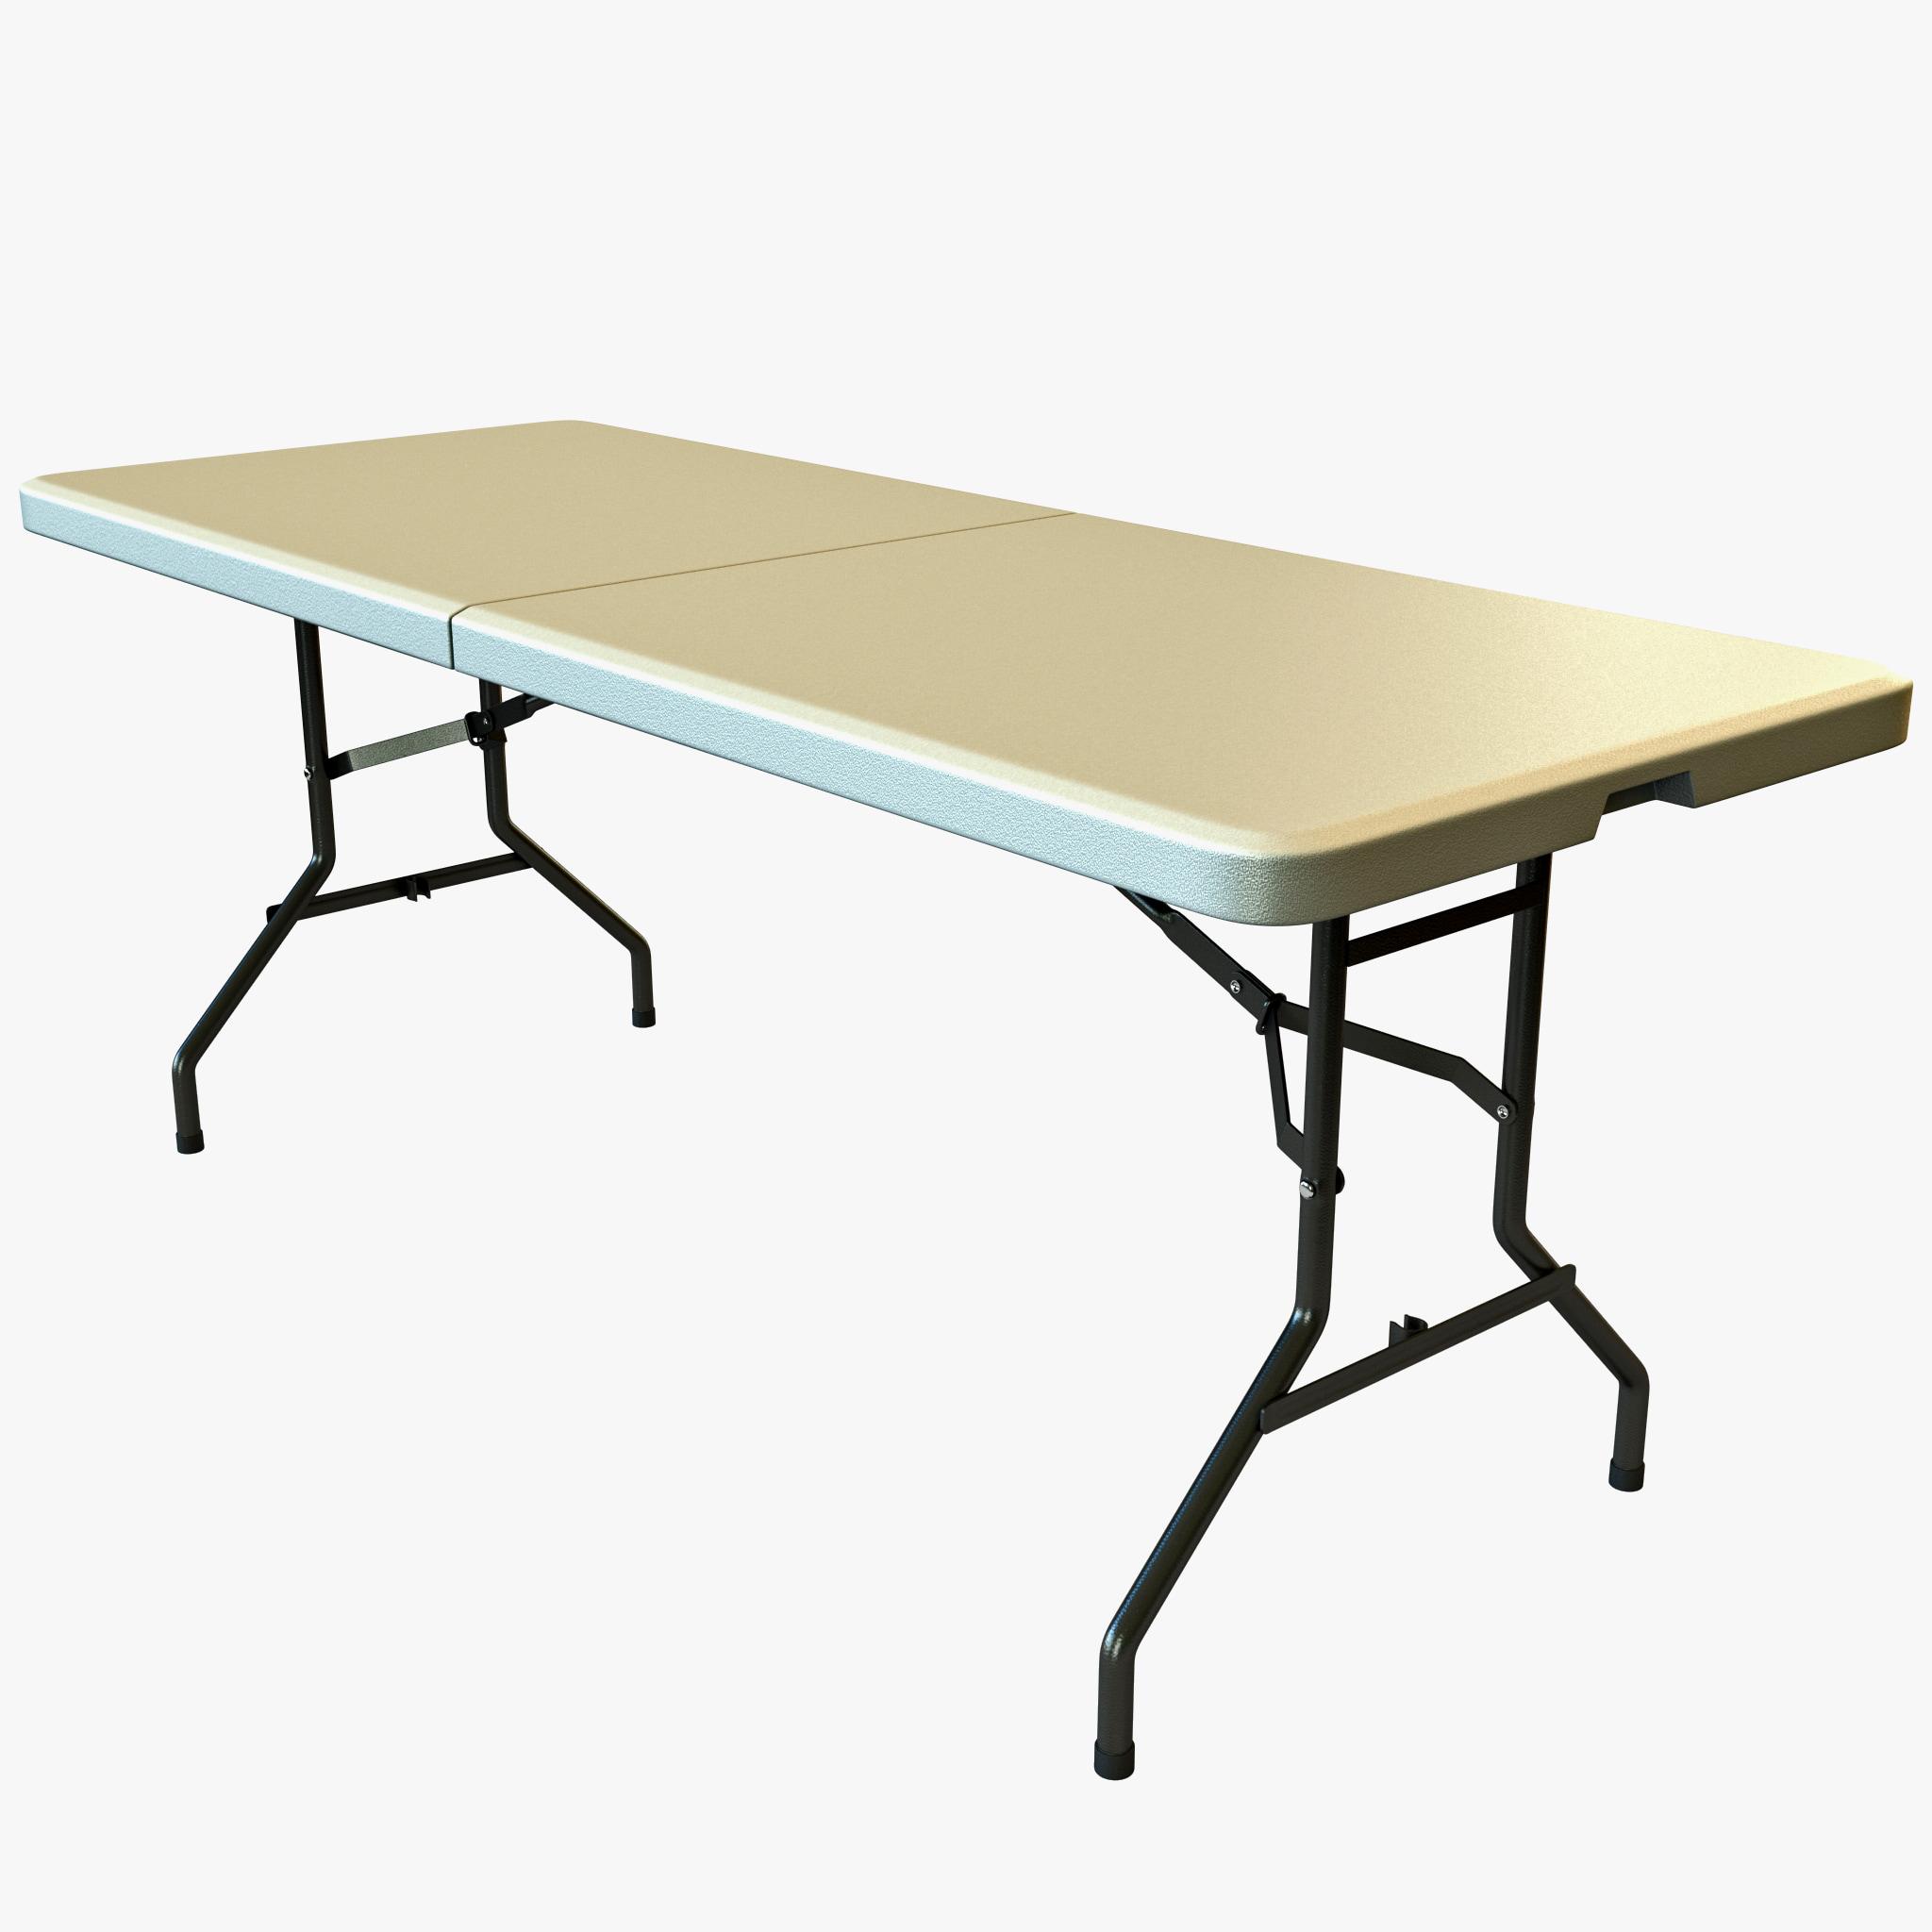 Folding Plastic Table picture on Folding Plastic Table767320 with Folding Plastic Table, Folding Table 843d0dd84a48939f1c85f497820c09c1